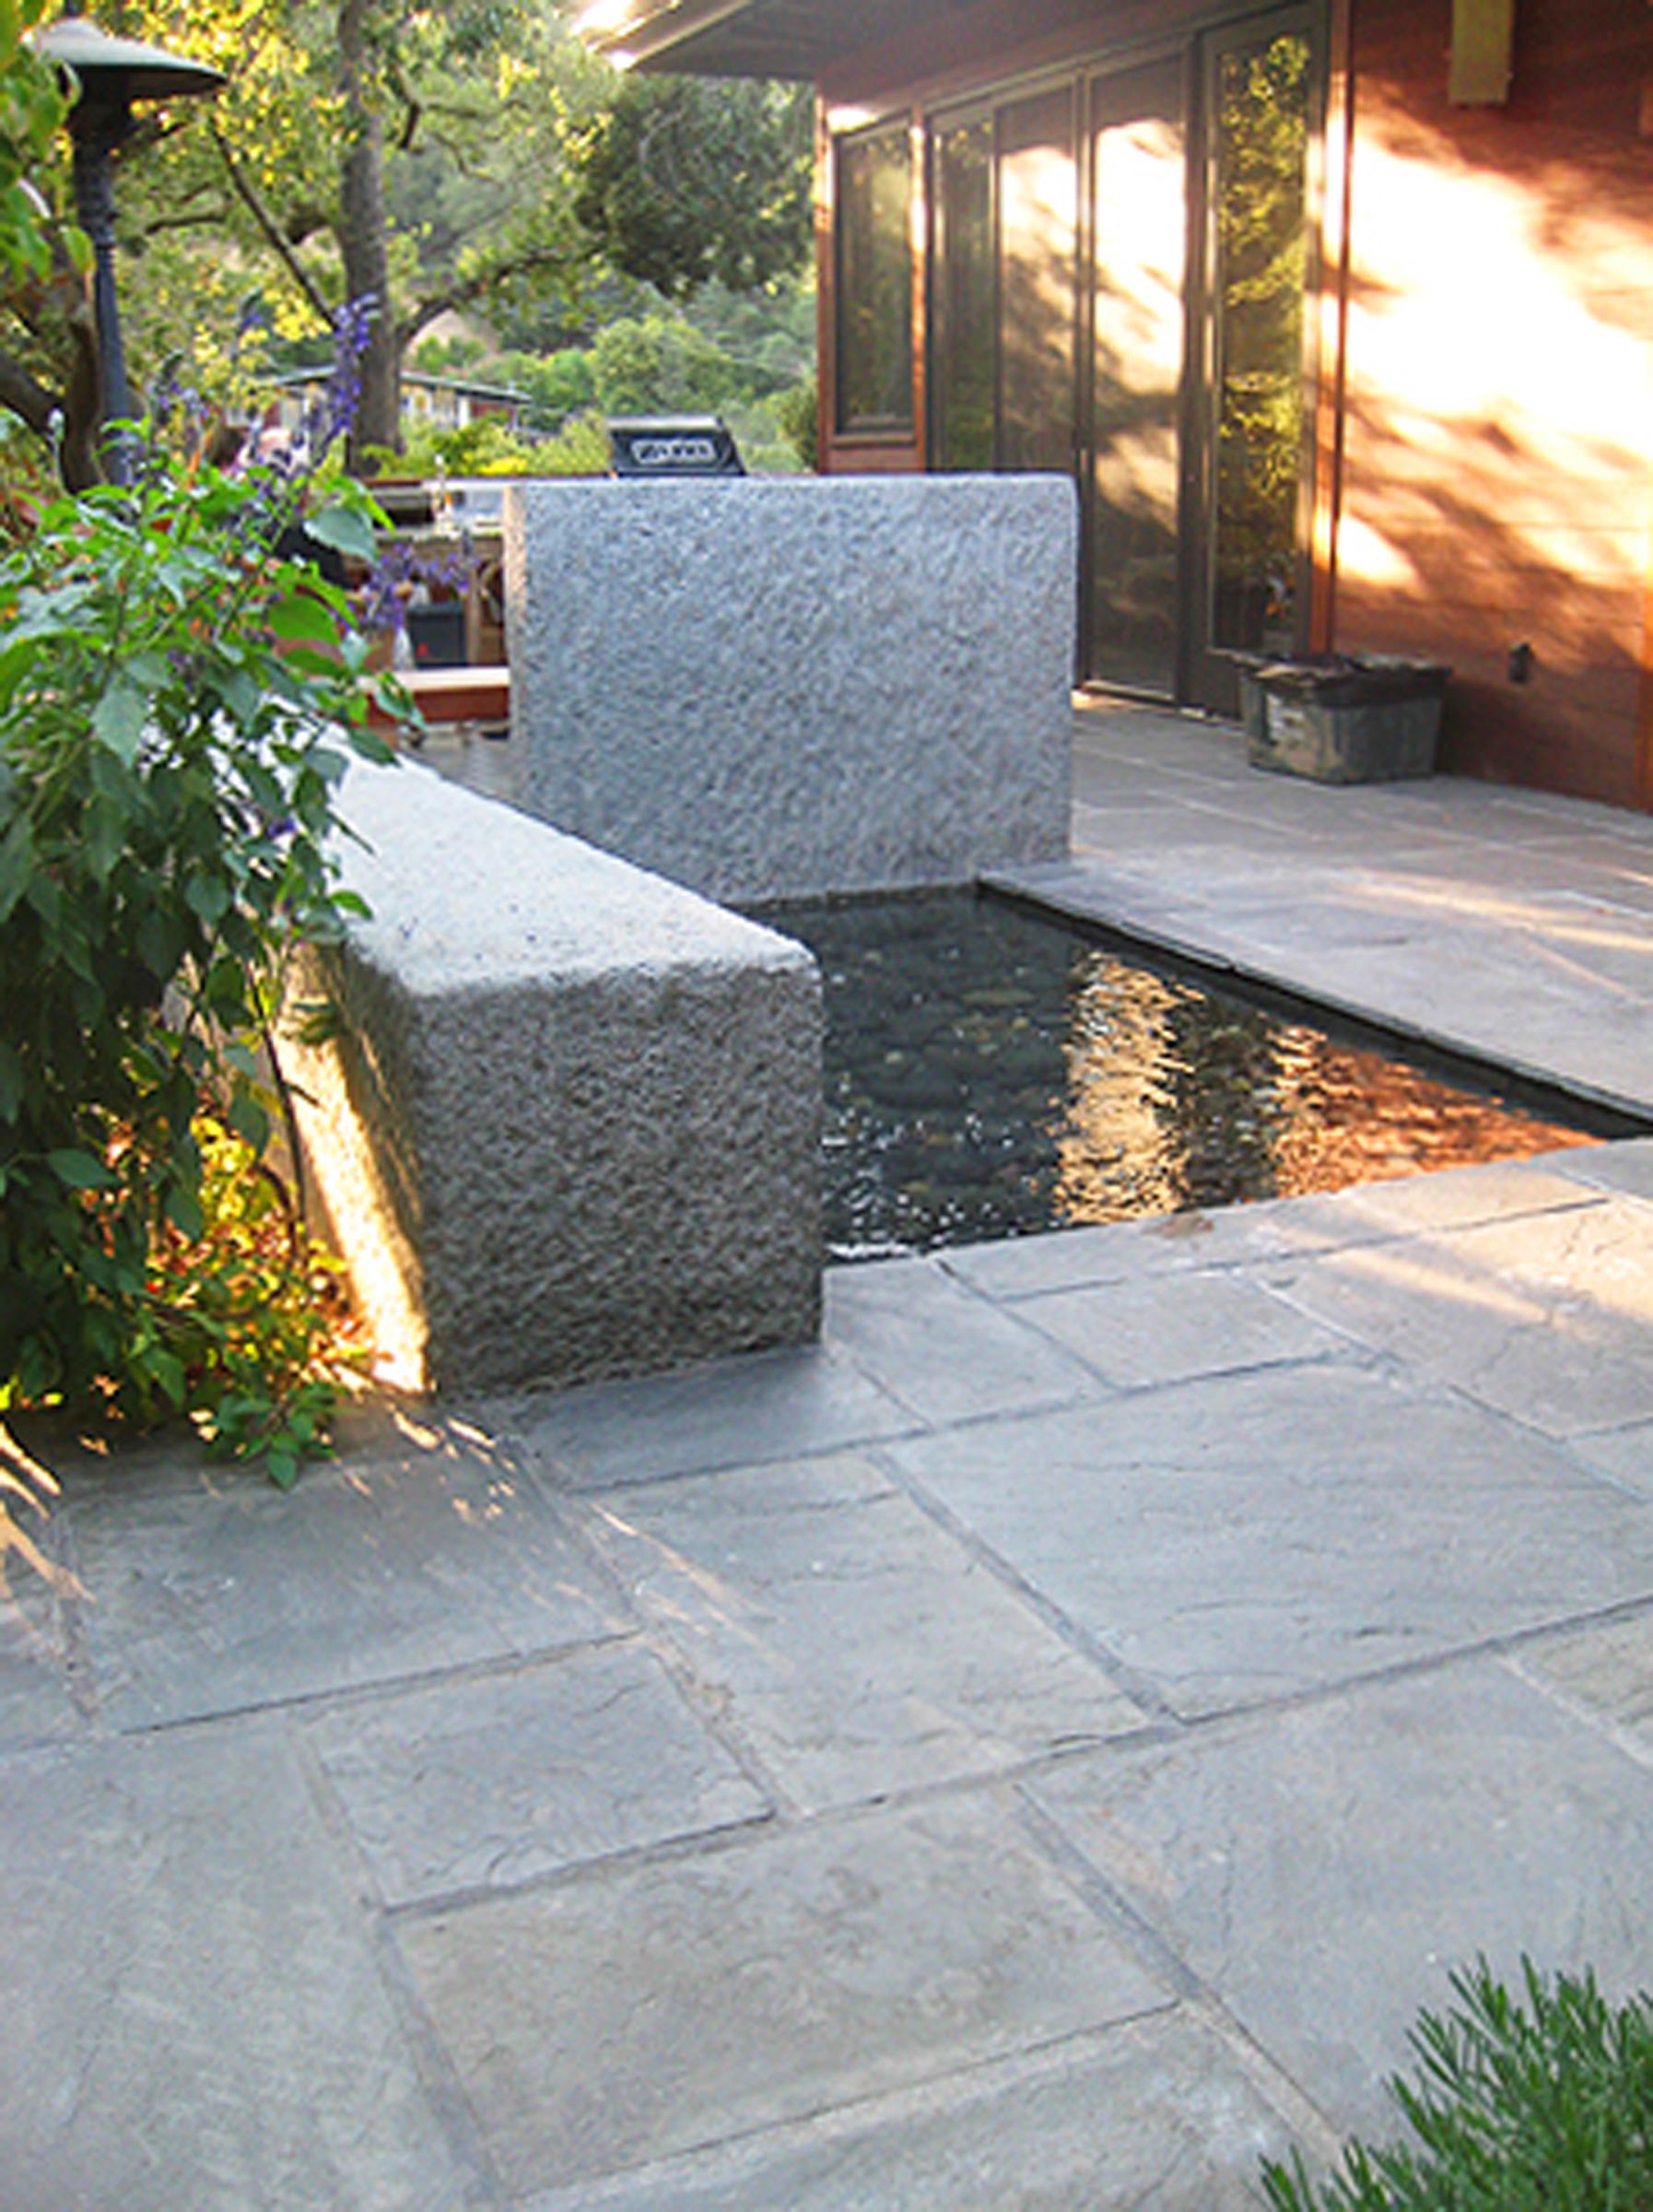 2 5 Siesta Fountain 2 copy.jpg